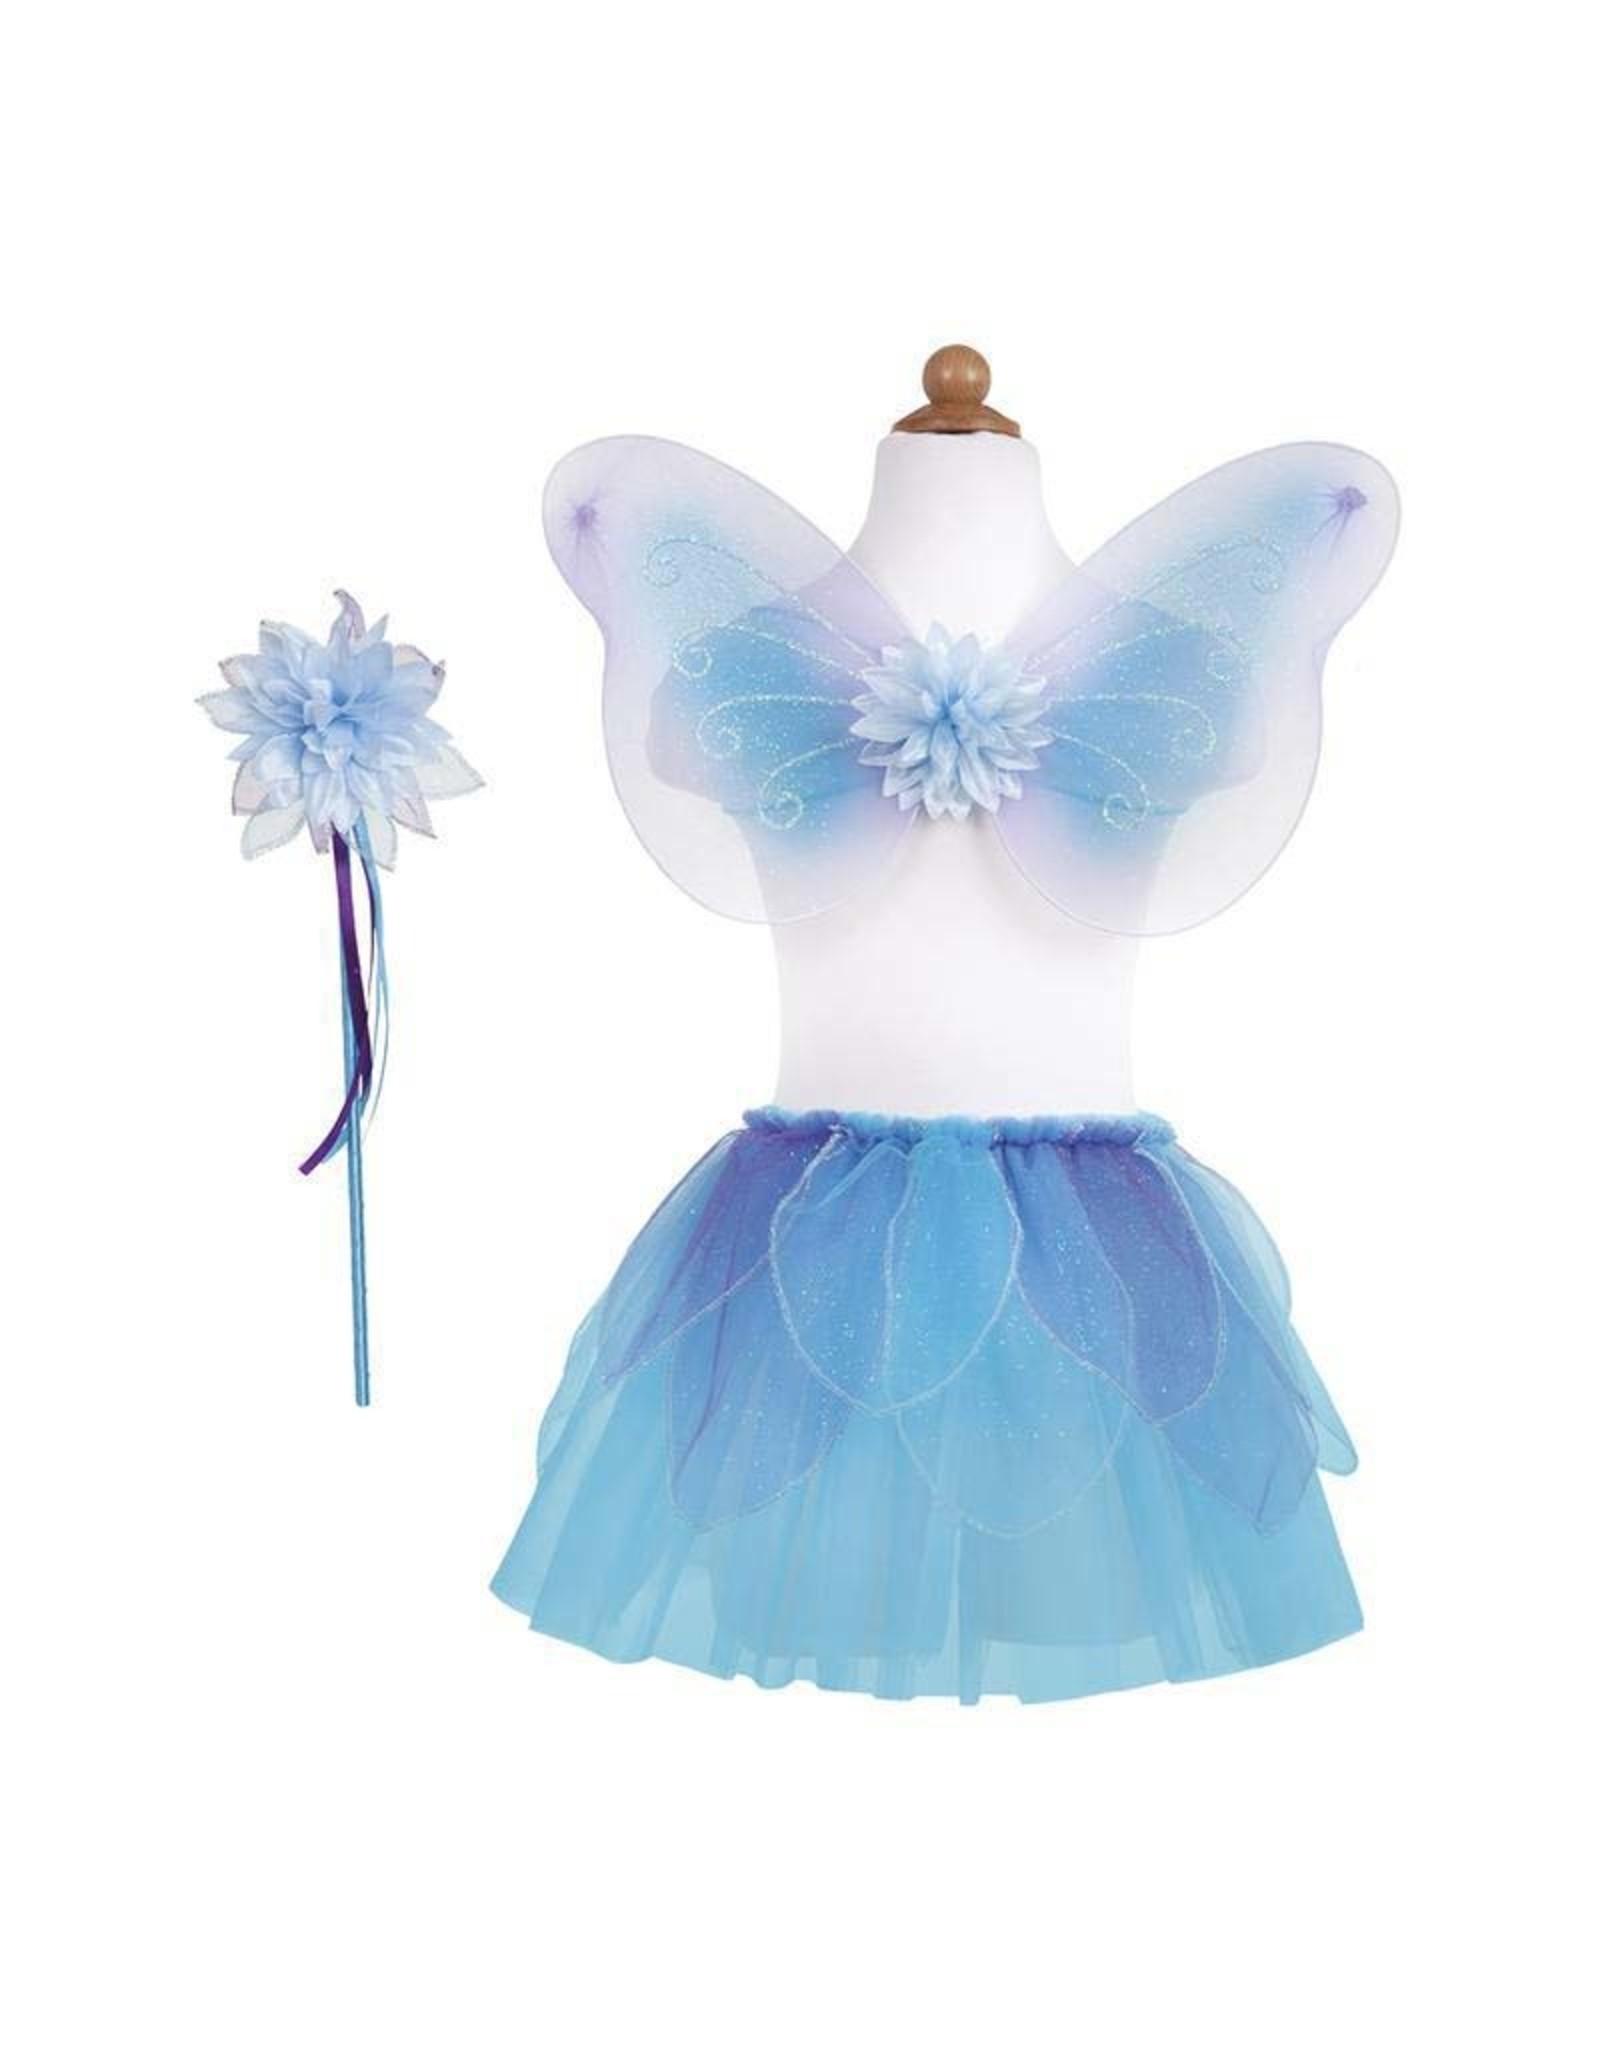 Great Pretenders Fancy Flutter Skirt with Wings & Wand, Blue, Size 4-7